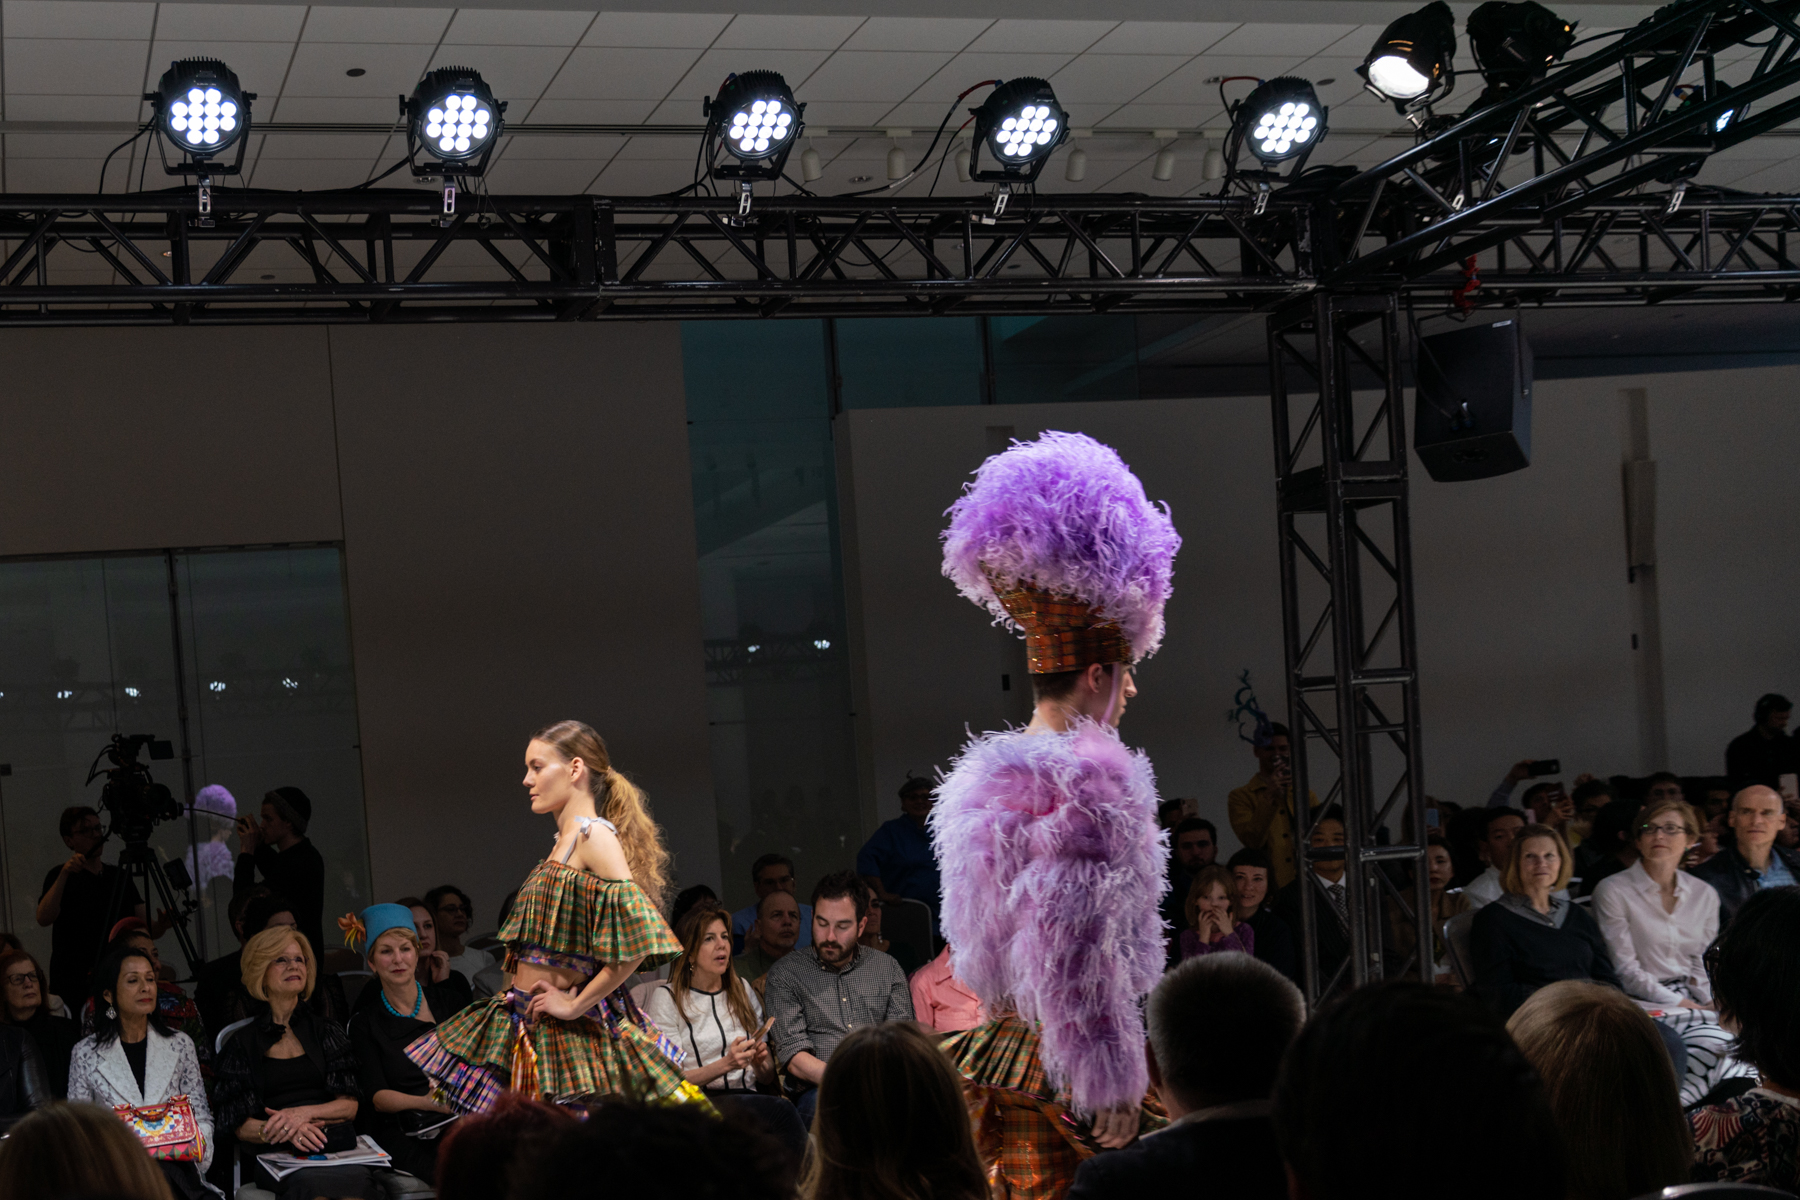 connor_fenwick_saic_fashion_event_lyons_02.jpg